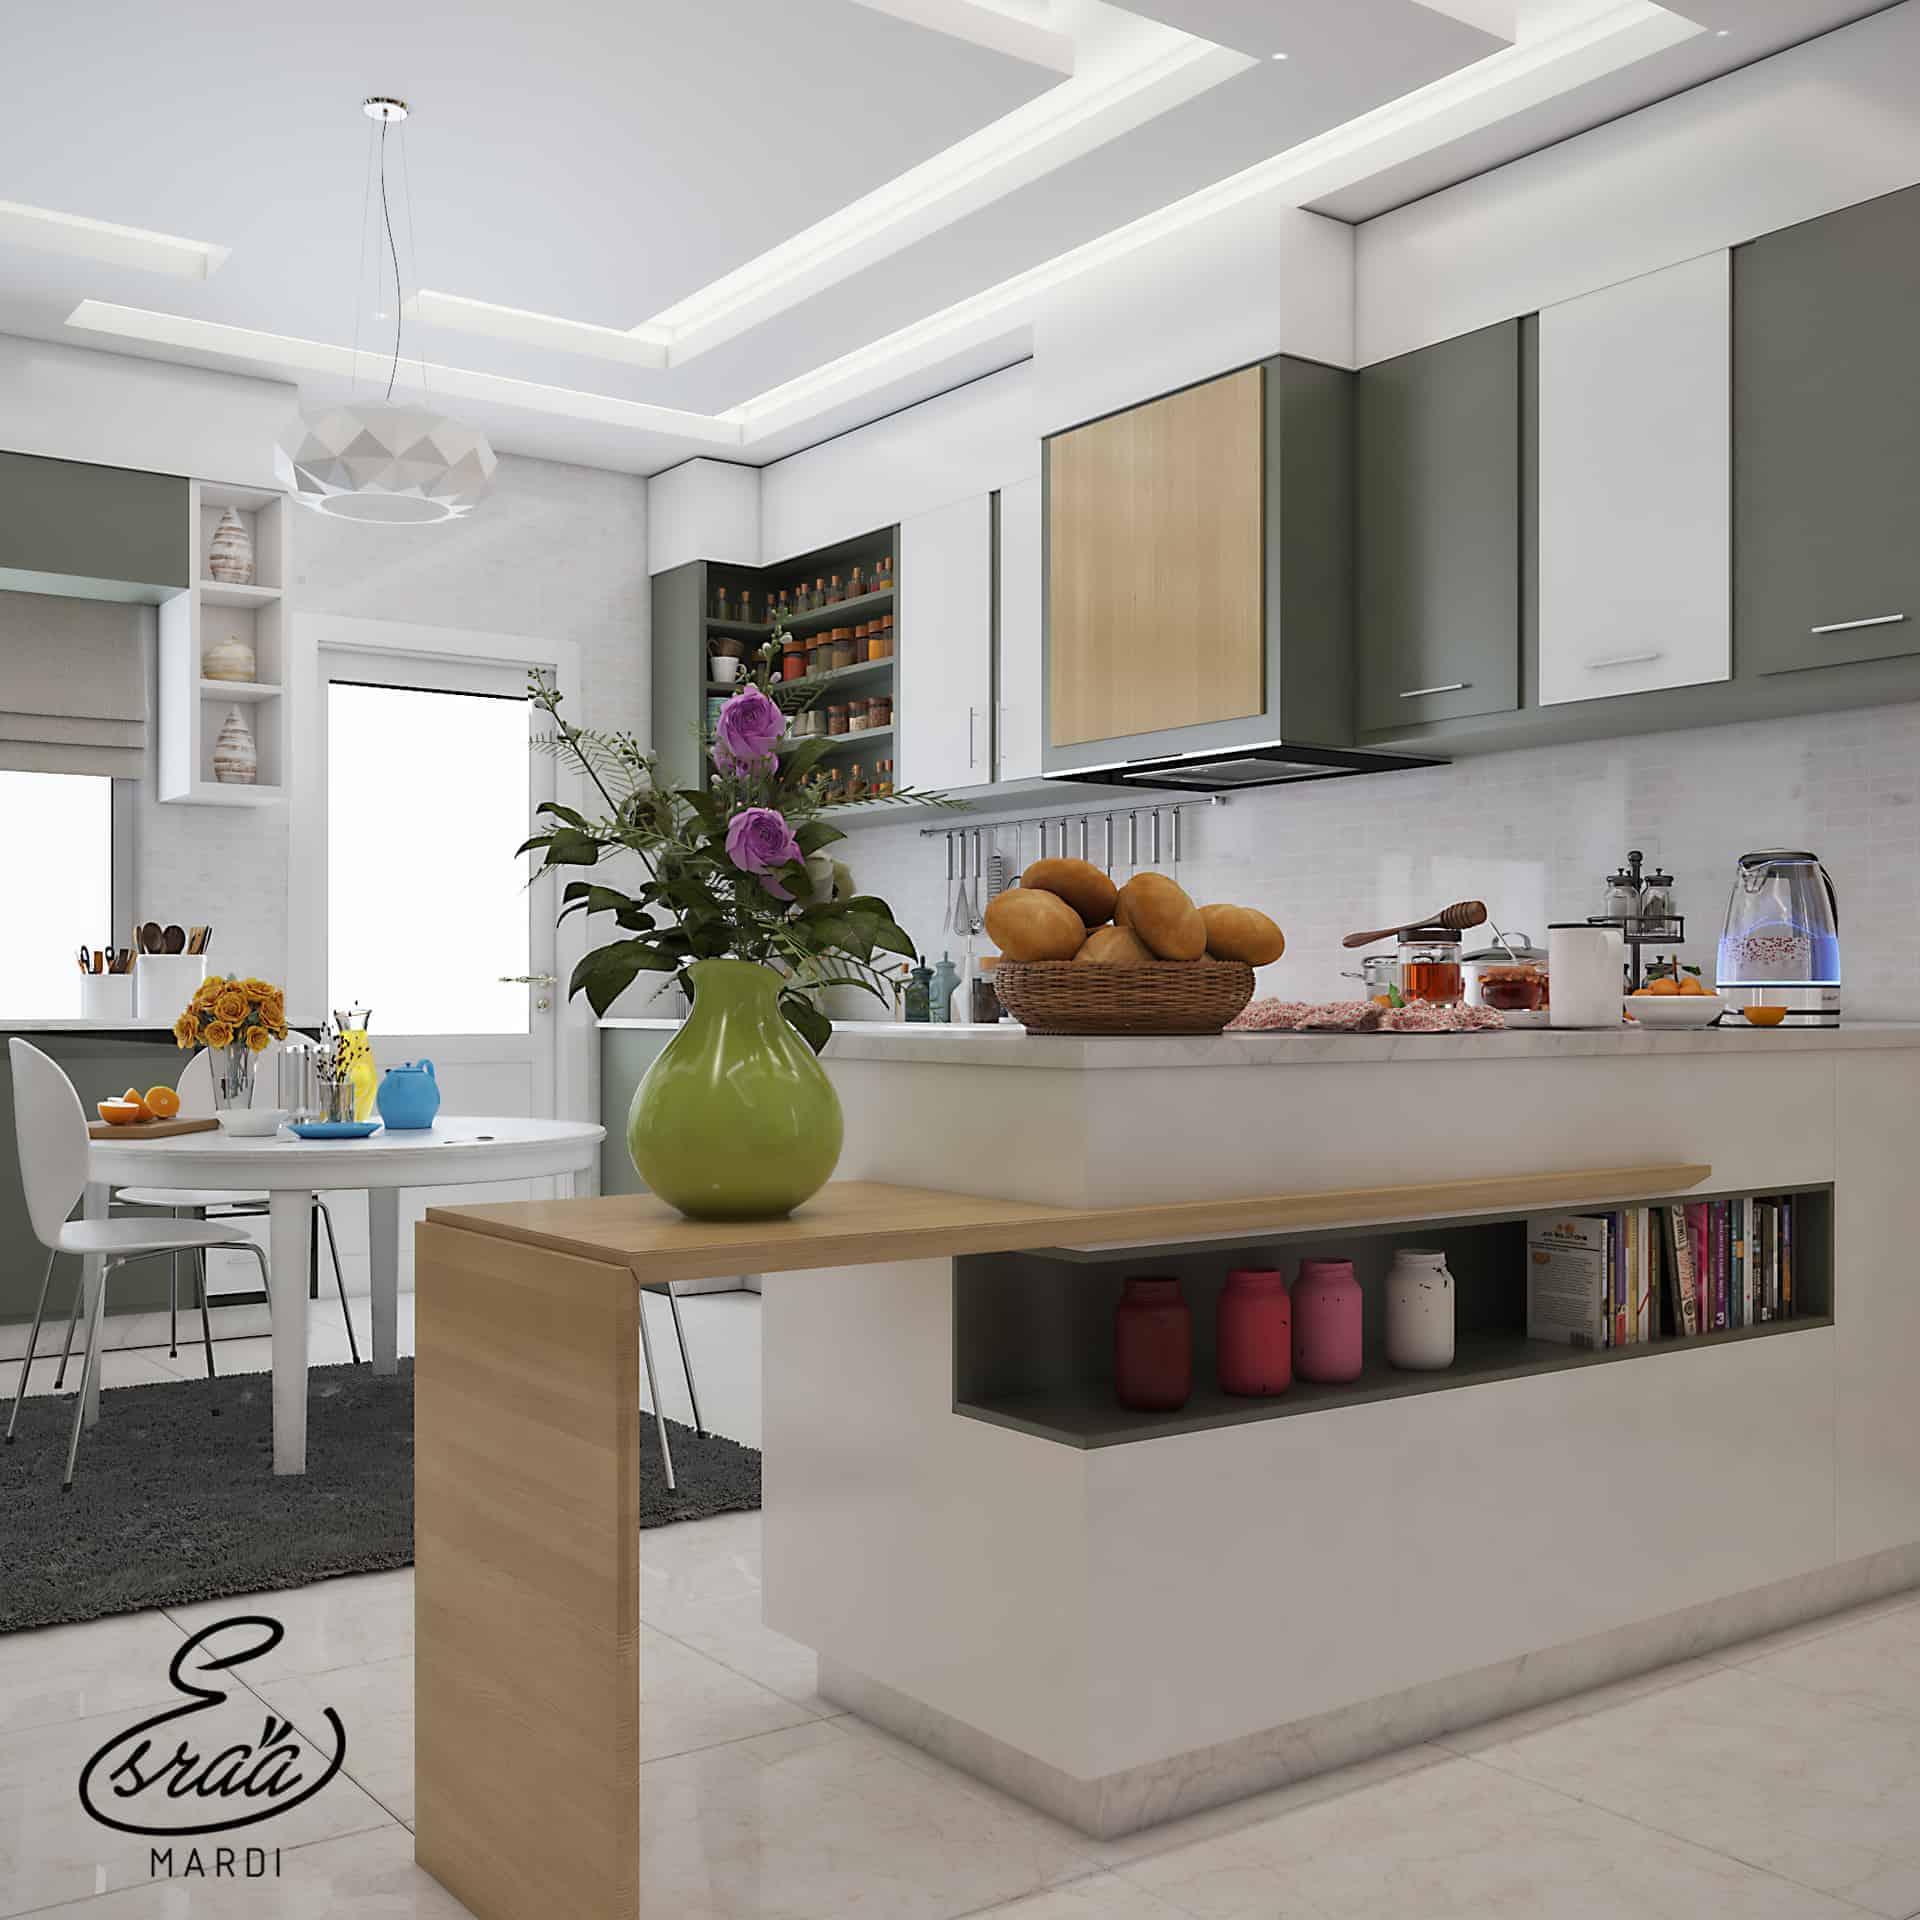 Living Area Decorating Ideas: Living Area & Kitchen